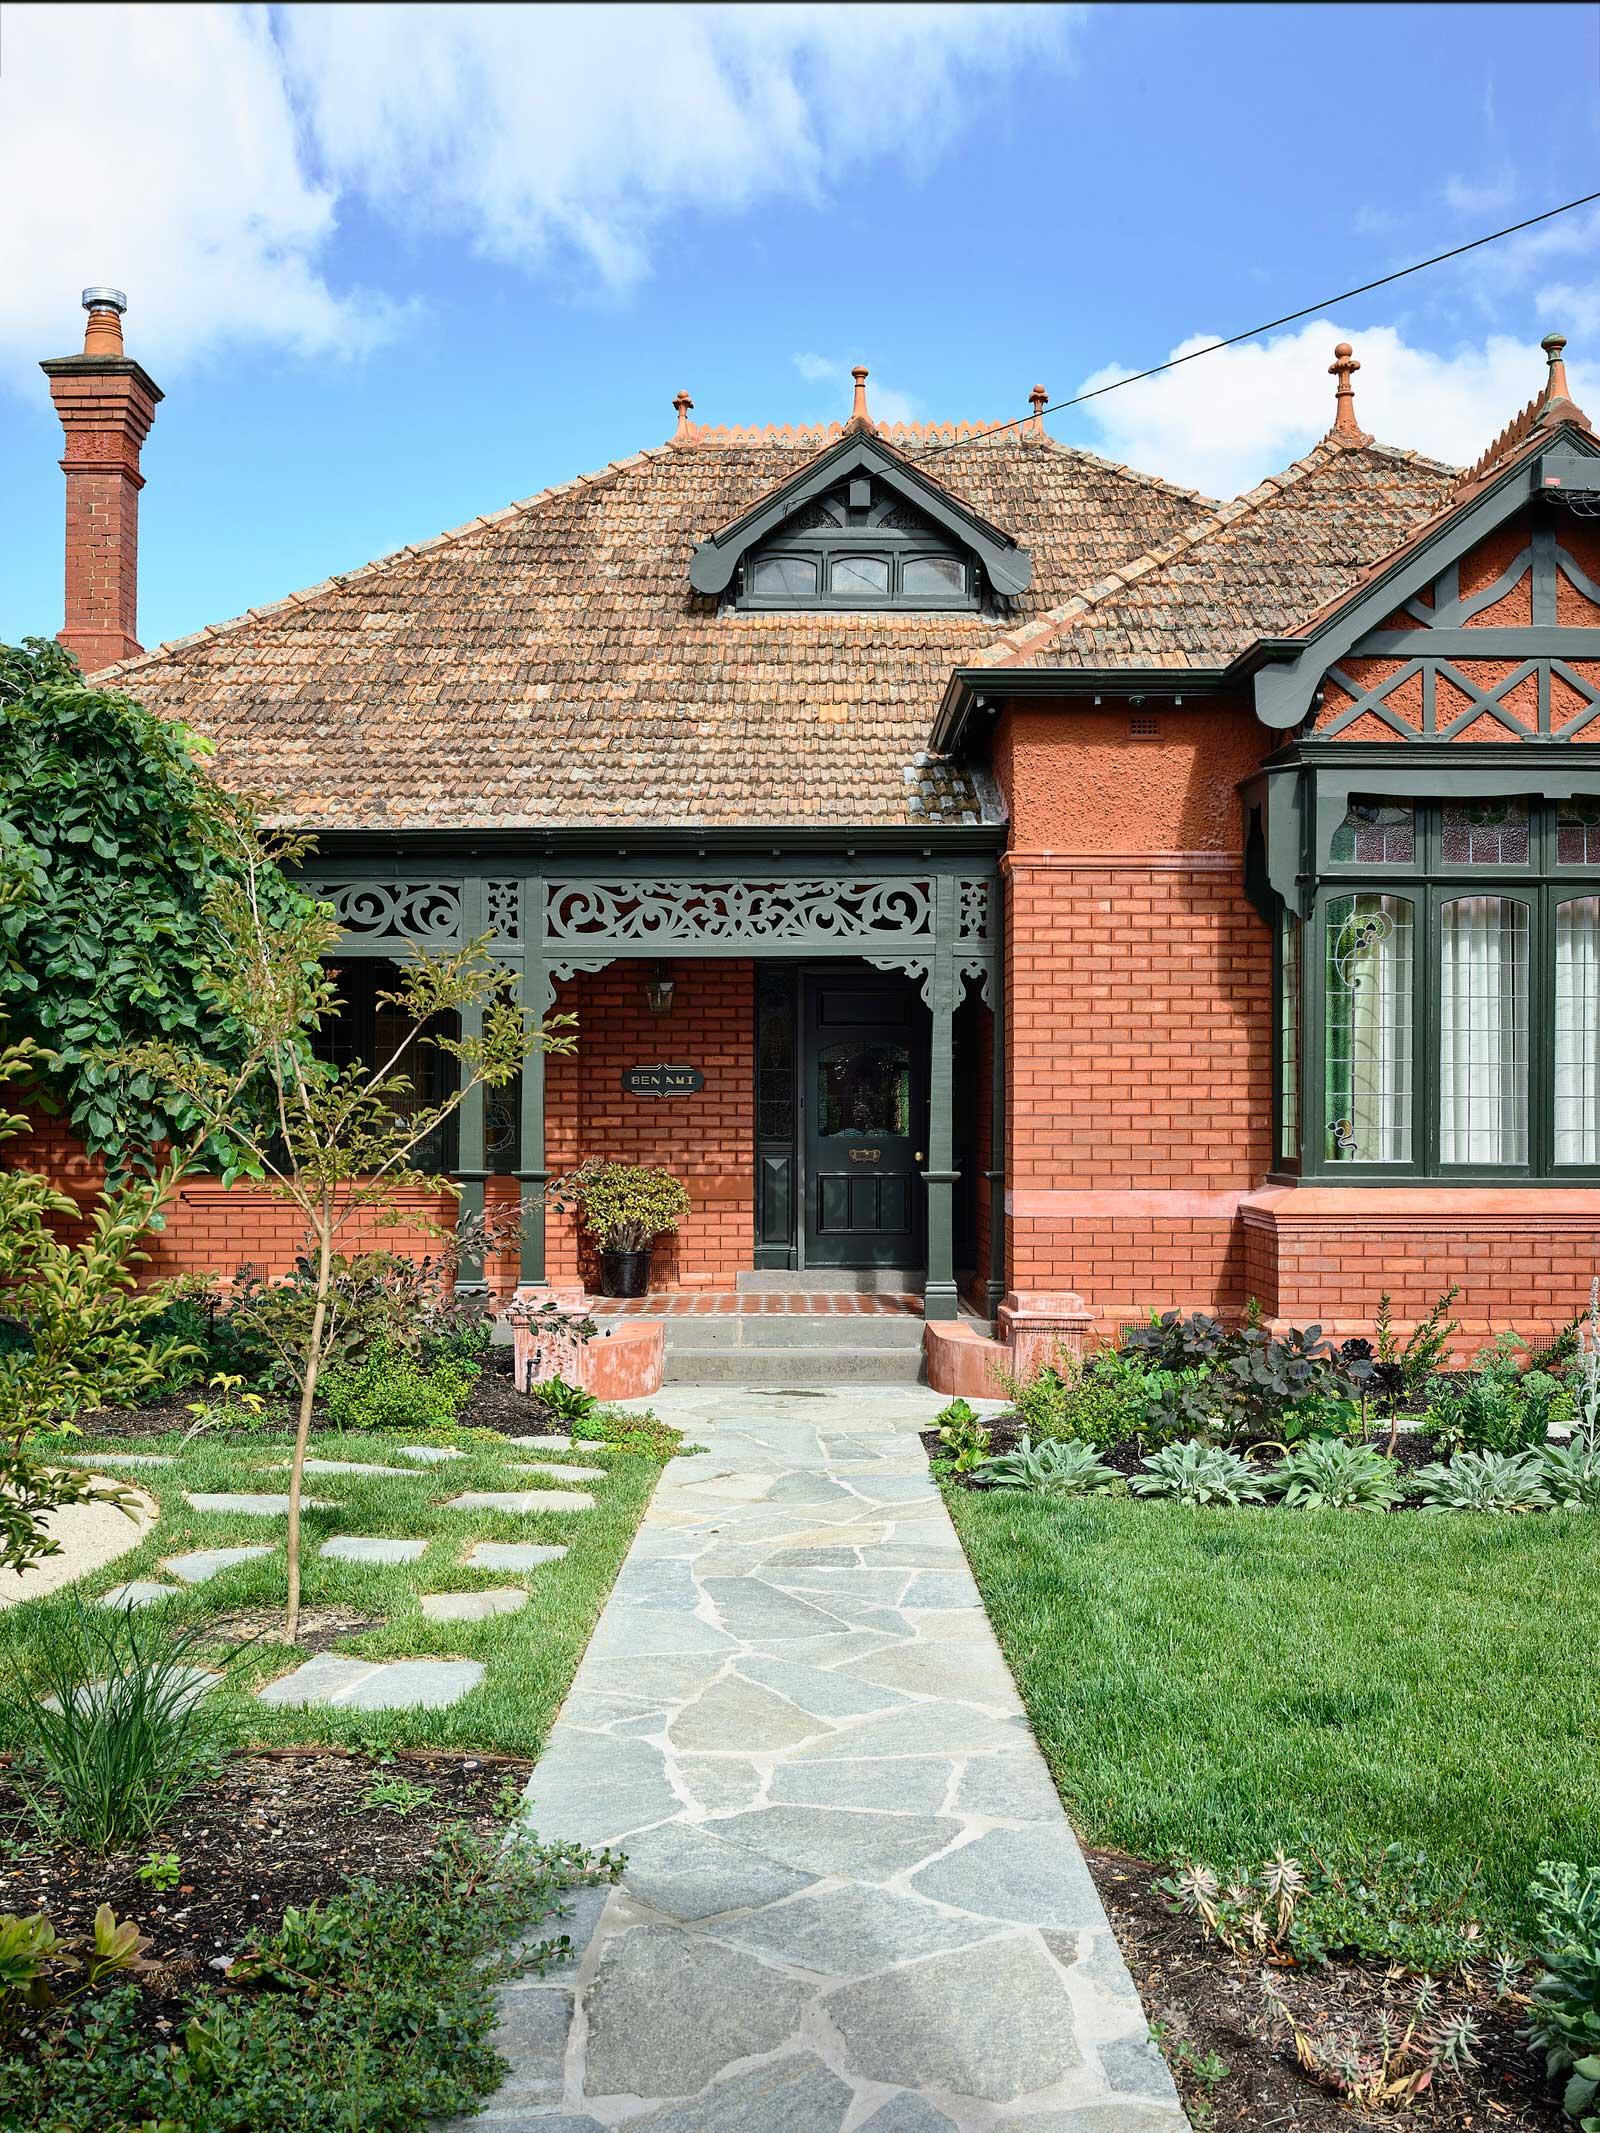 Kennedy Nolan Elsternwick House Melbourne Residential Architecture Photo Derek Swalwell Yellowtrace 01